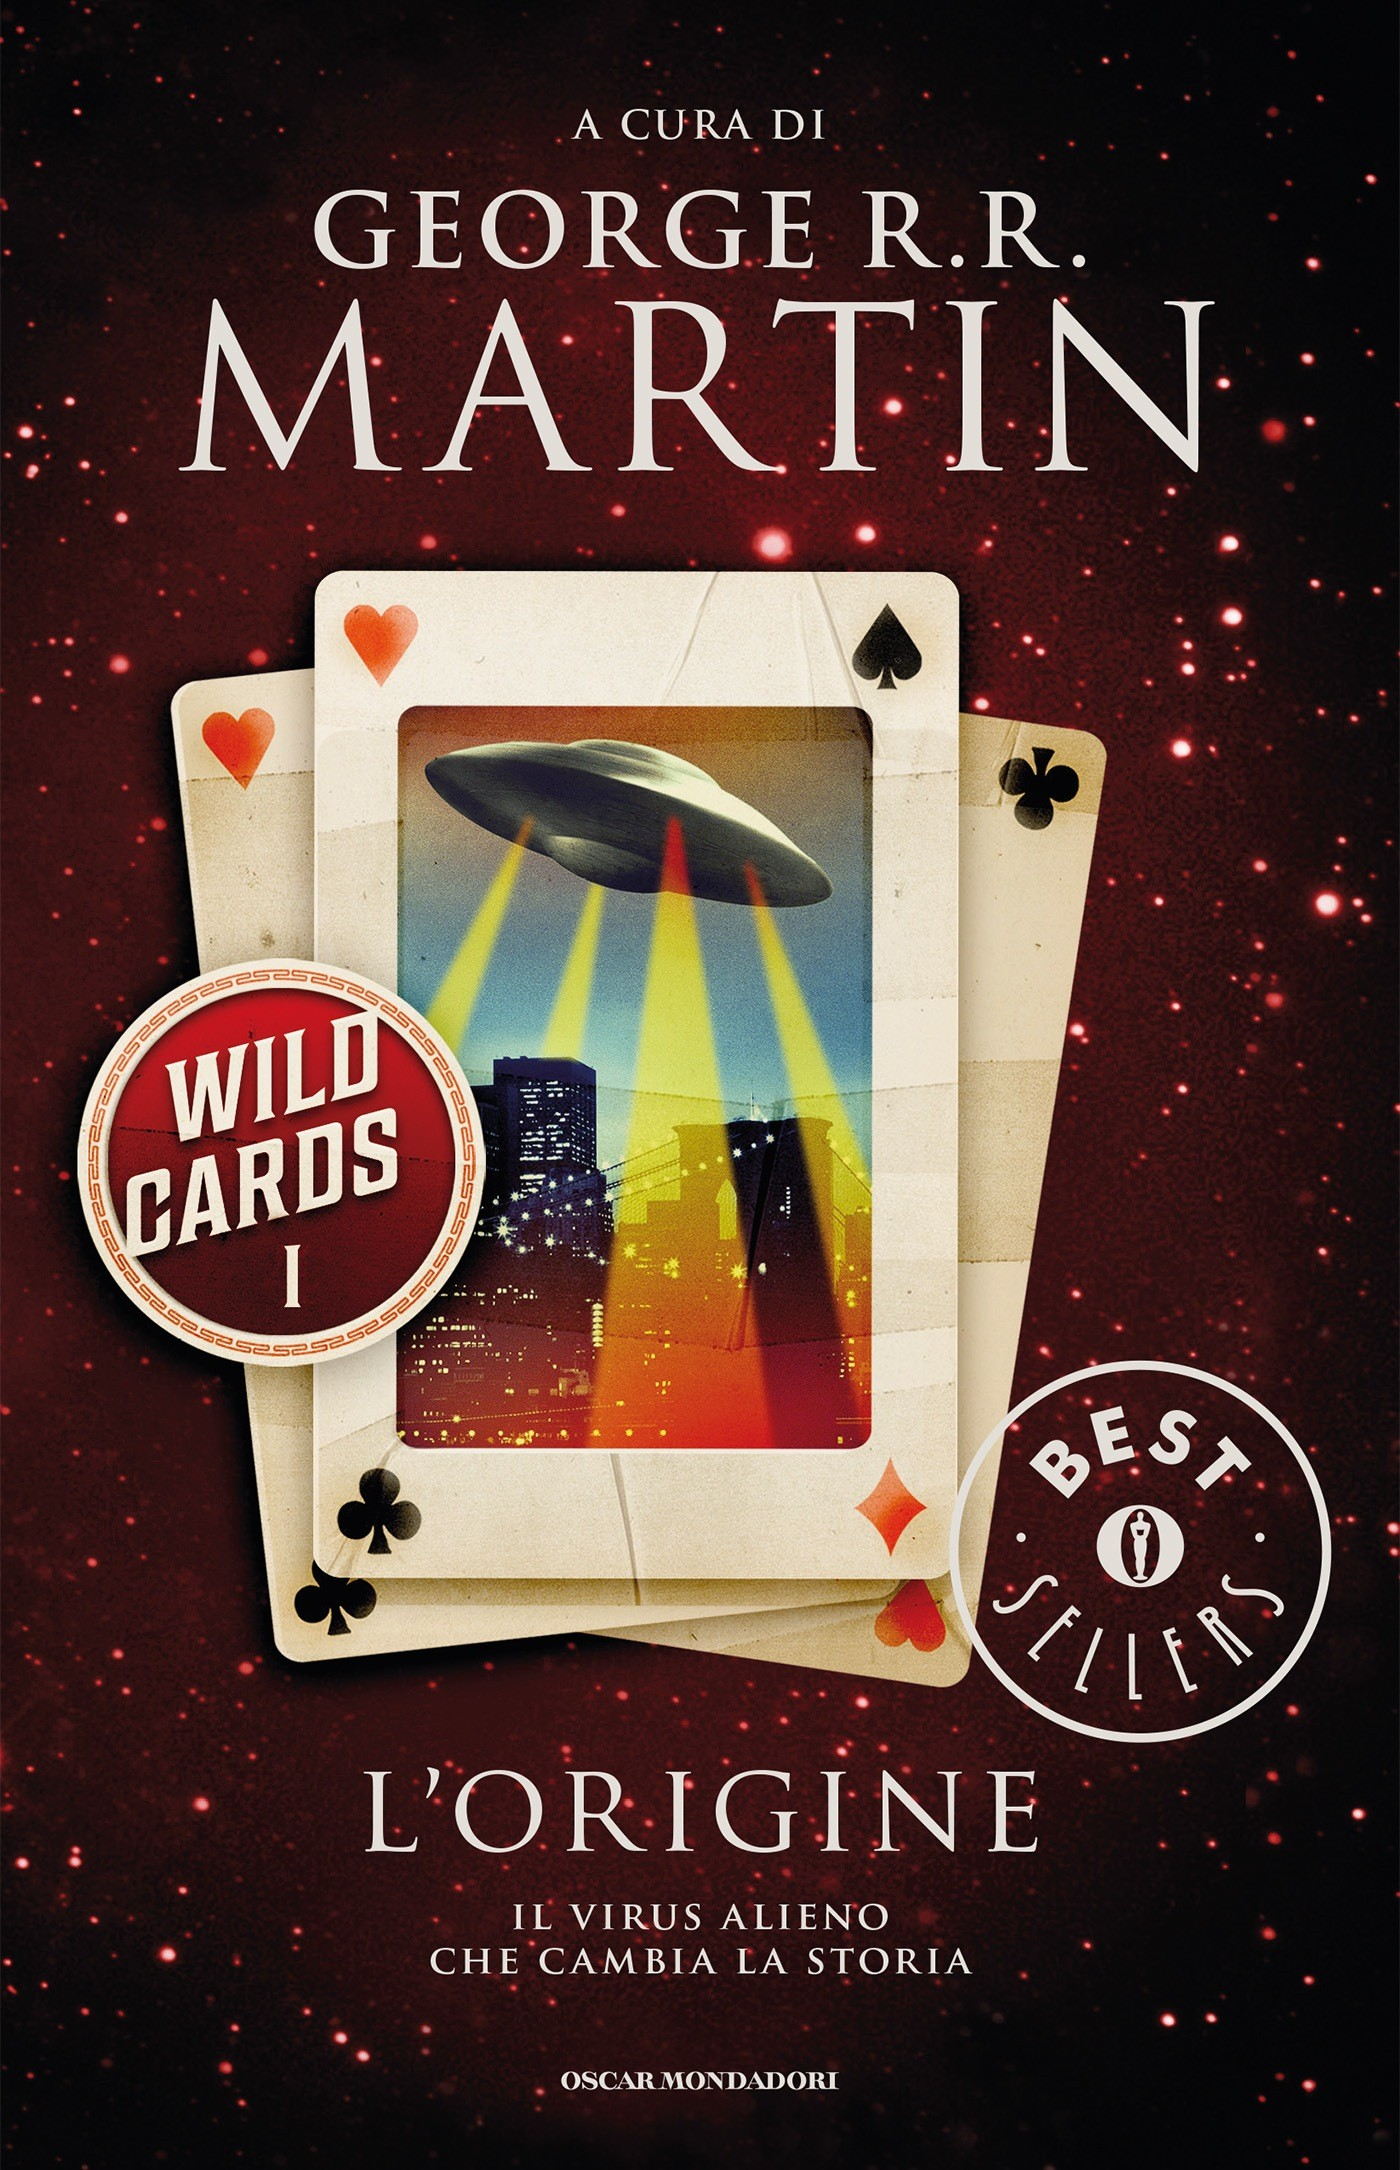 Gli ebook di george rr martin ebook bookrepublic wild cards 1 lorigine di george rr martin fandeluxe Image collections